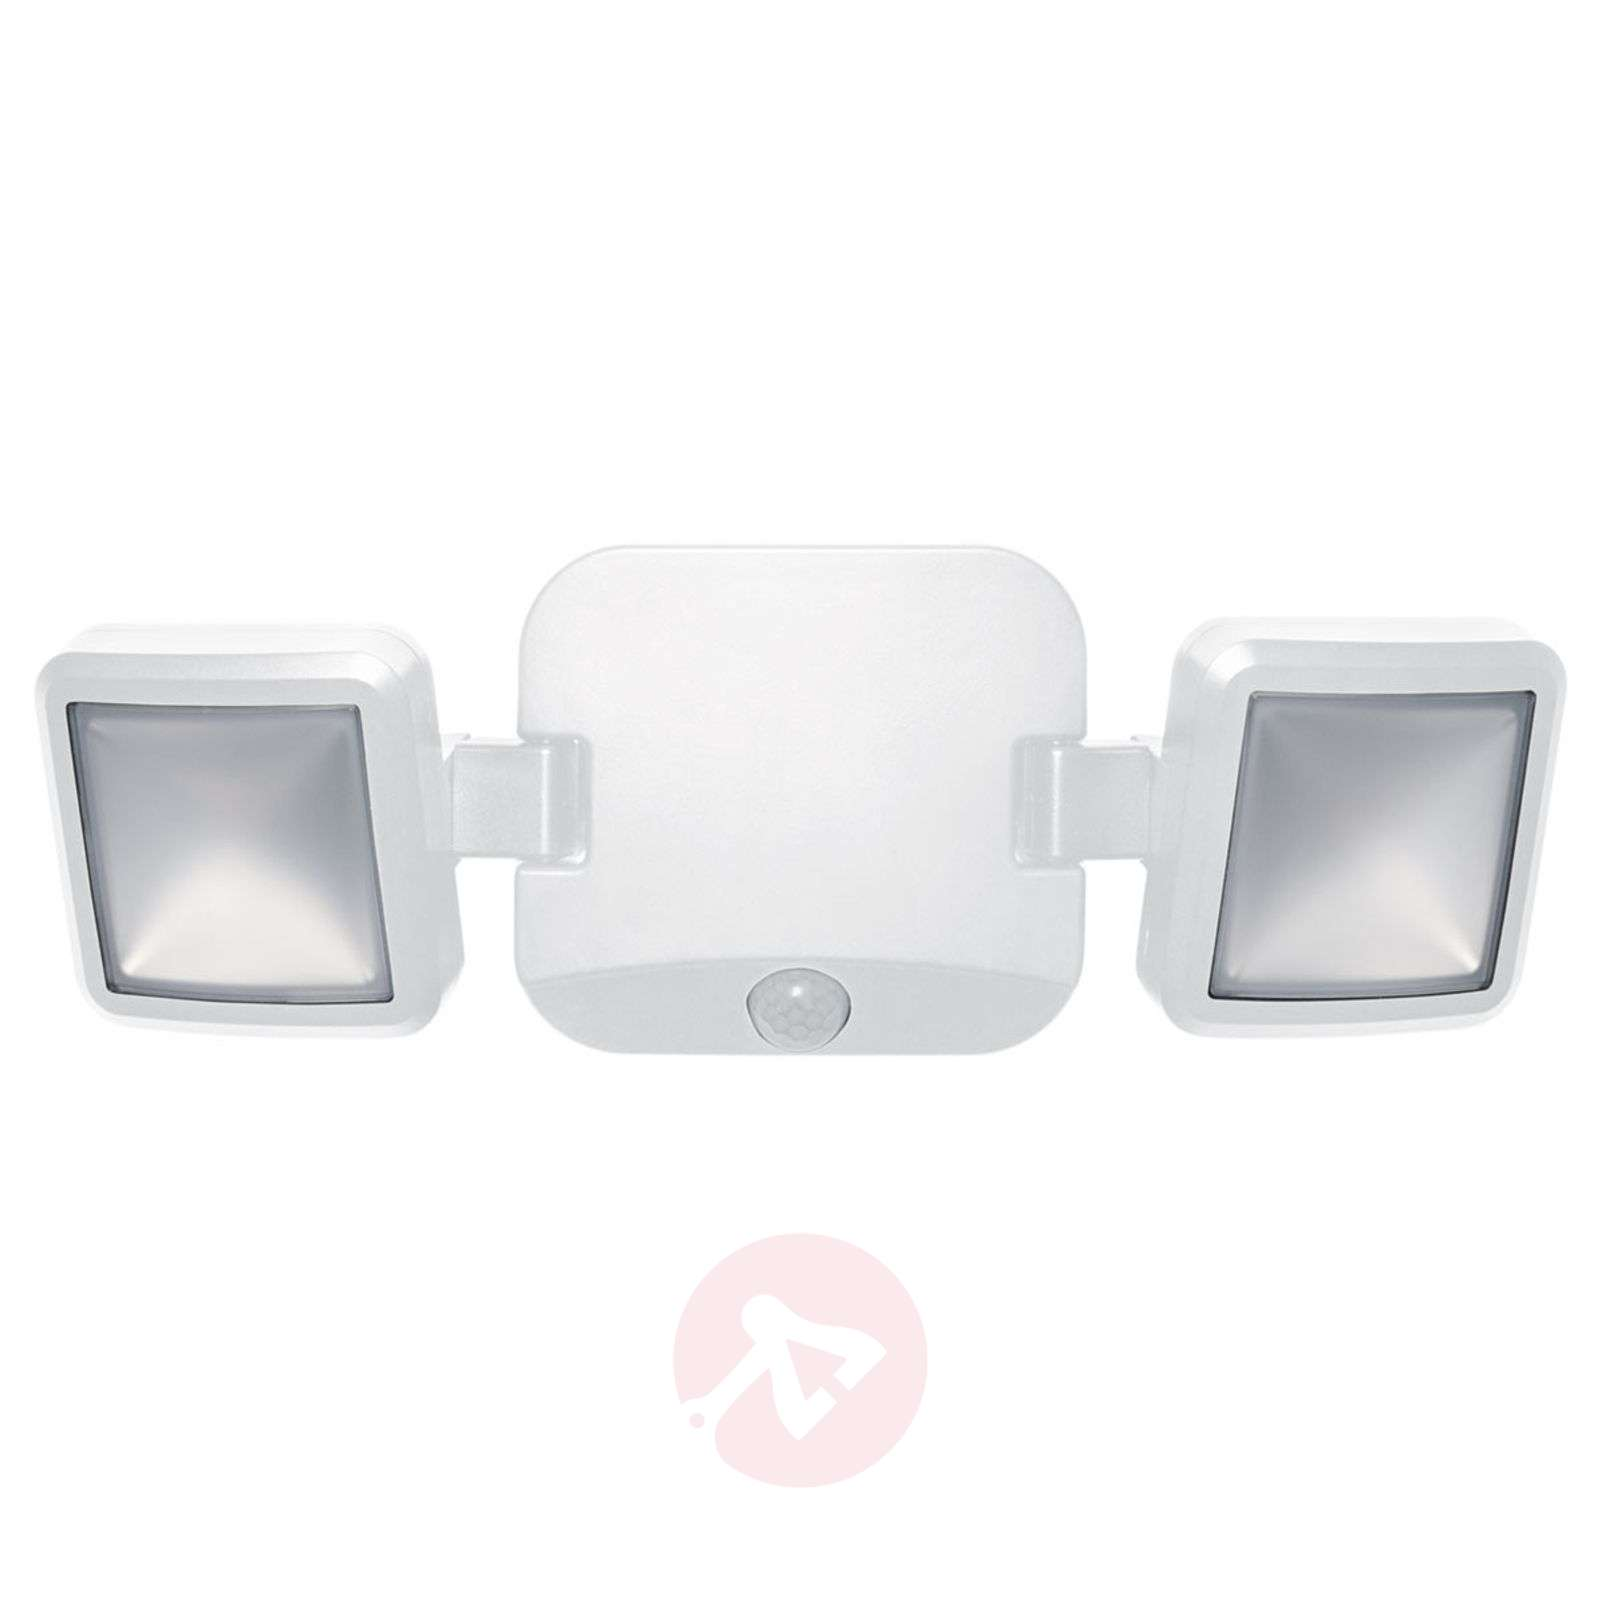 OSRAM Battery LED Spotlight wall lamp two-bulb-7261489-01